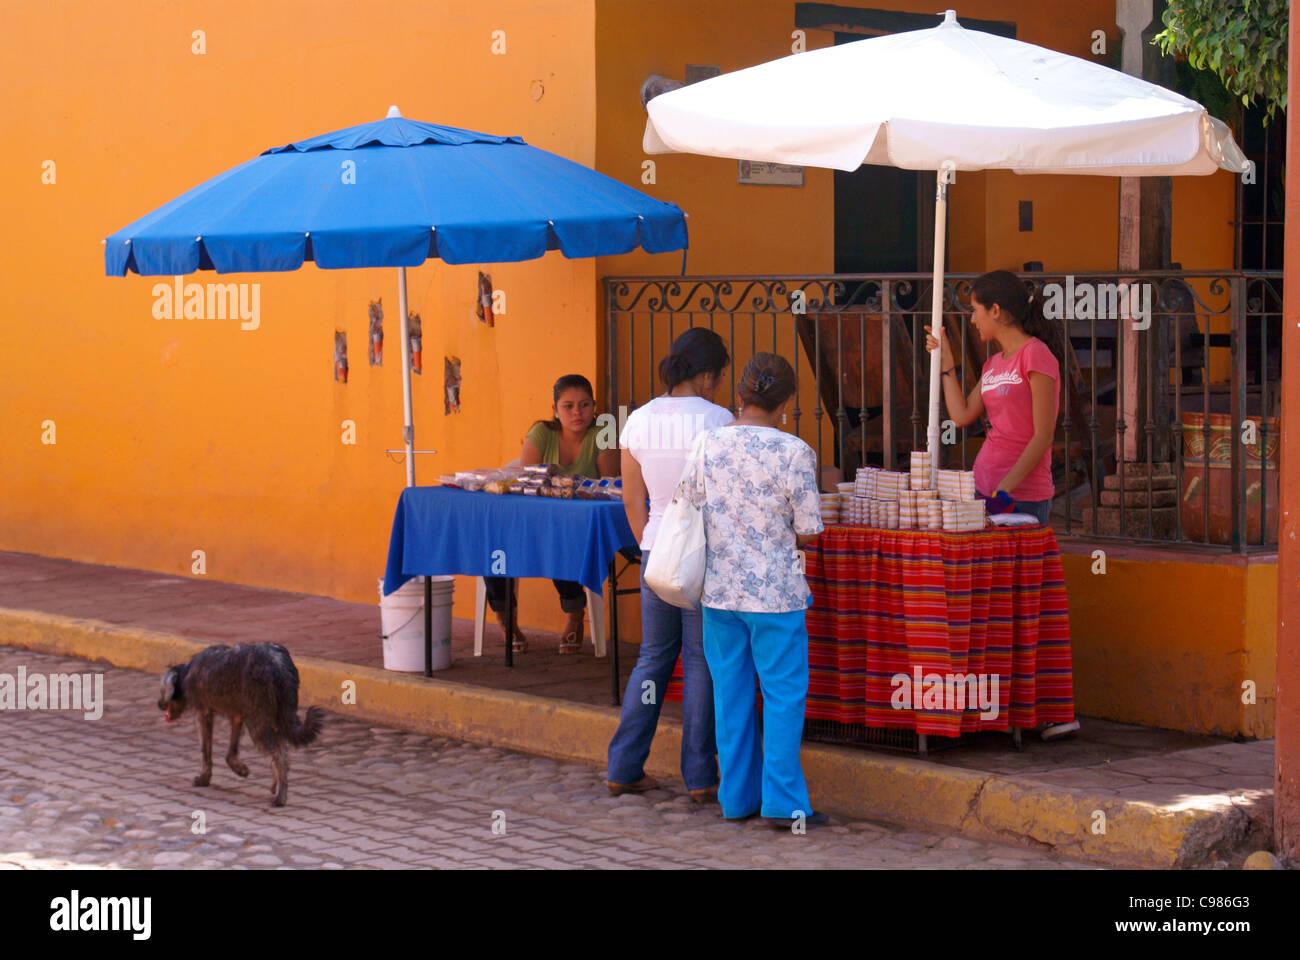 Street vendors in the town of El Quelite near Mazatlan, Sinaloa, Mexico - Stock Image